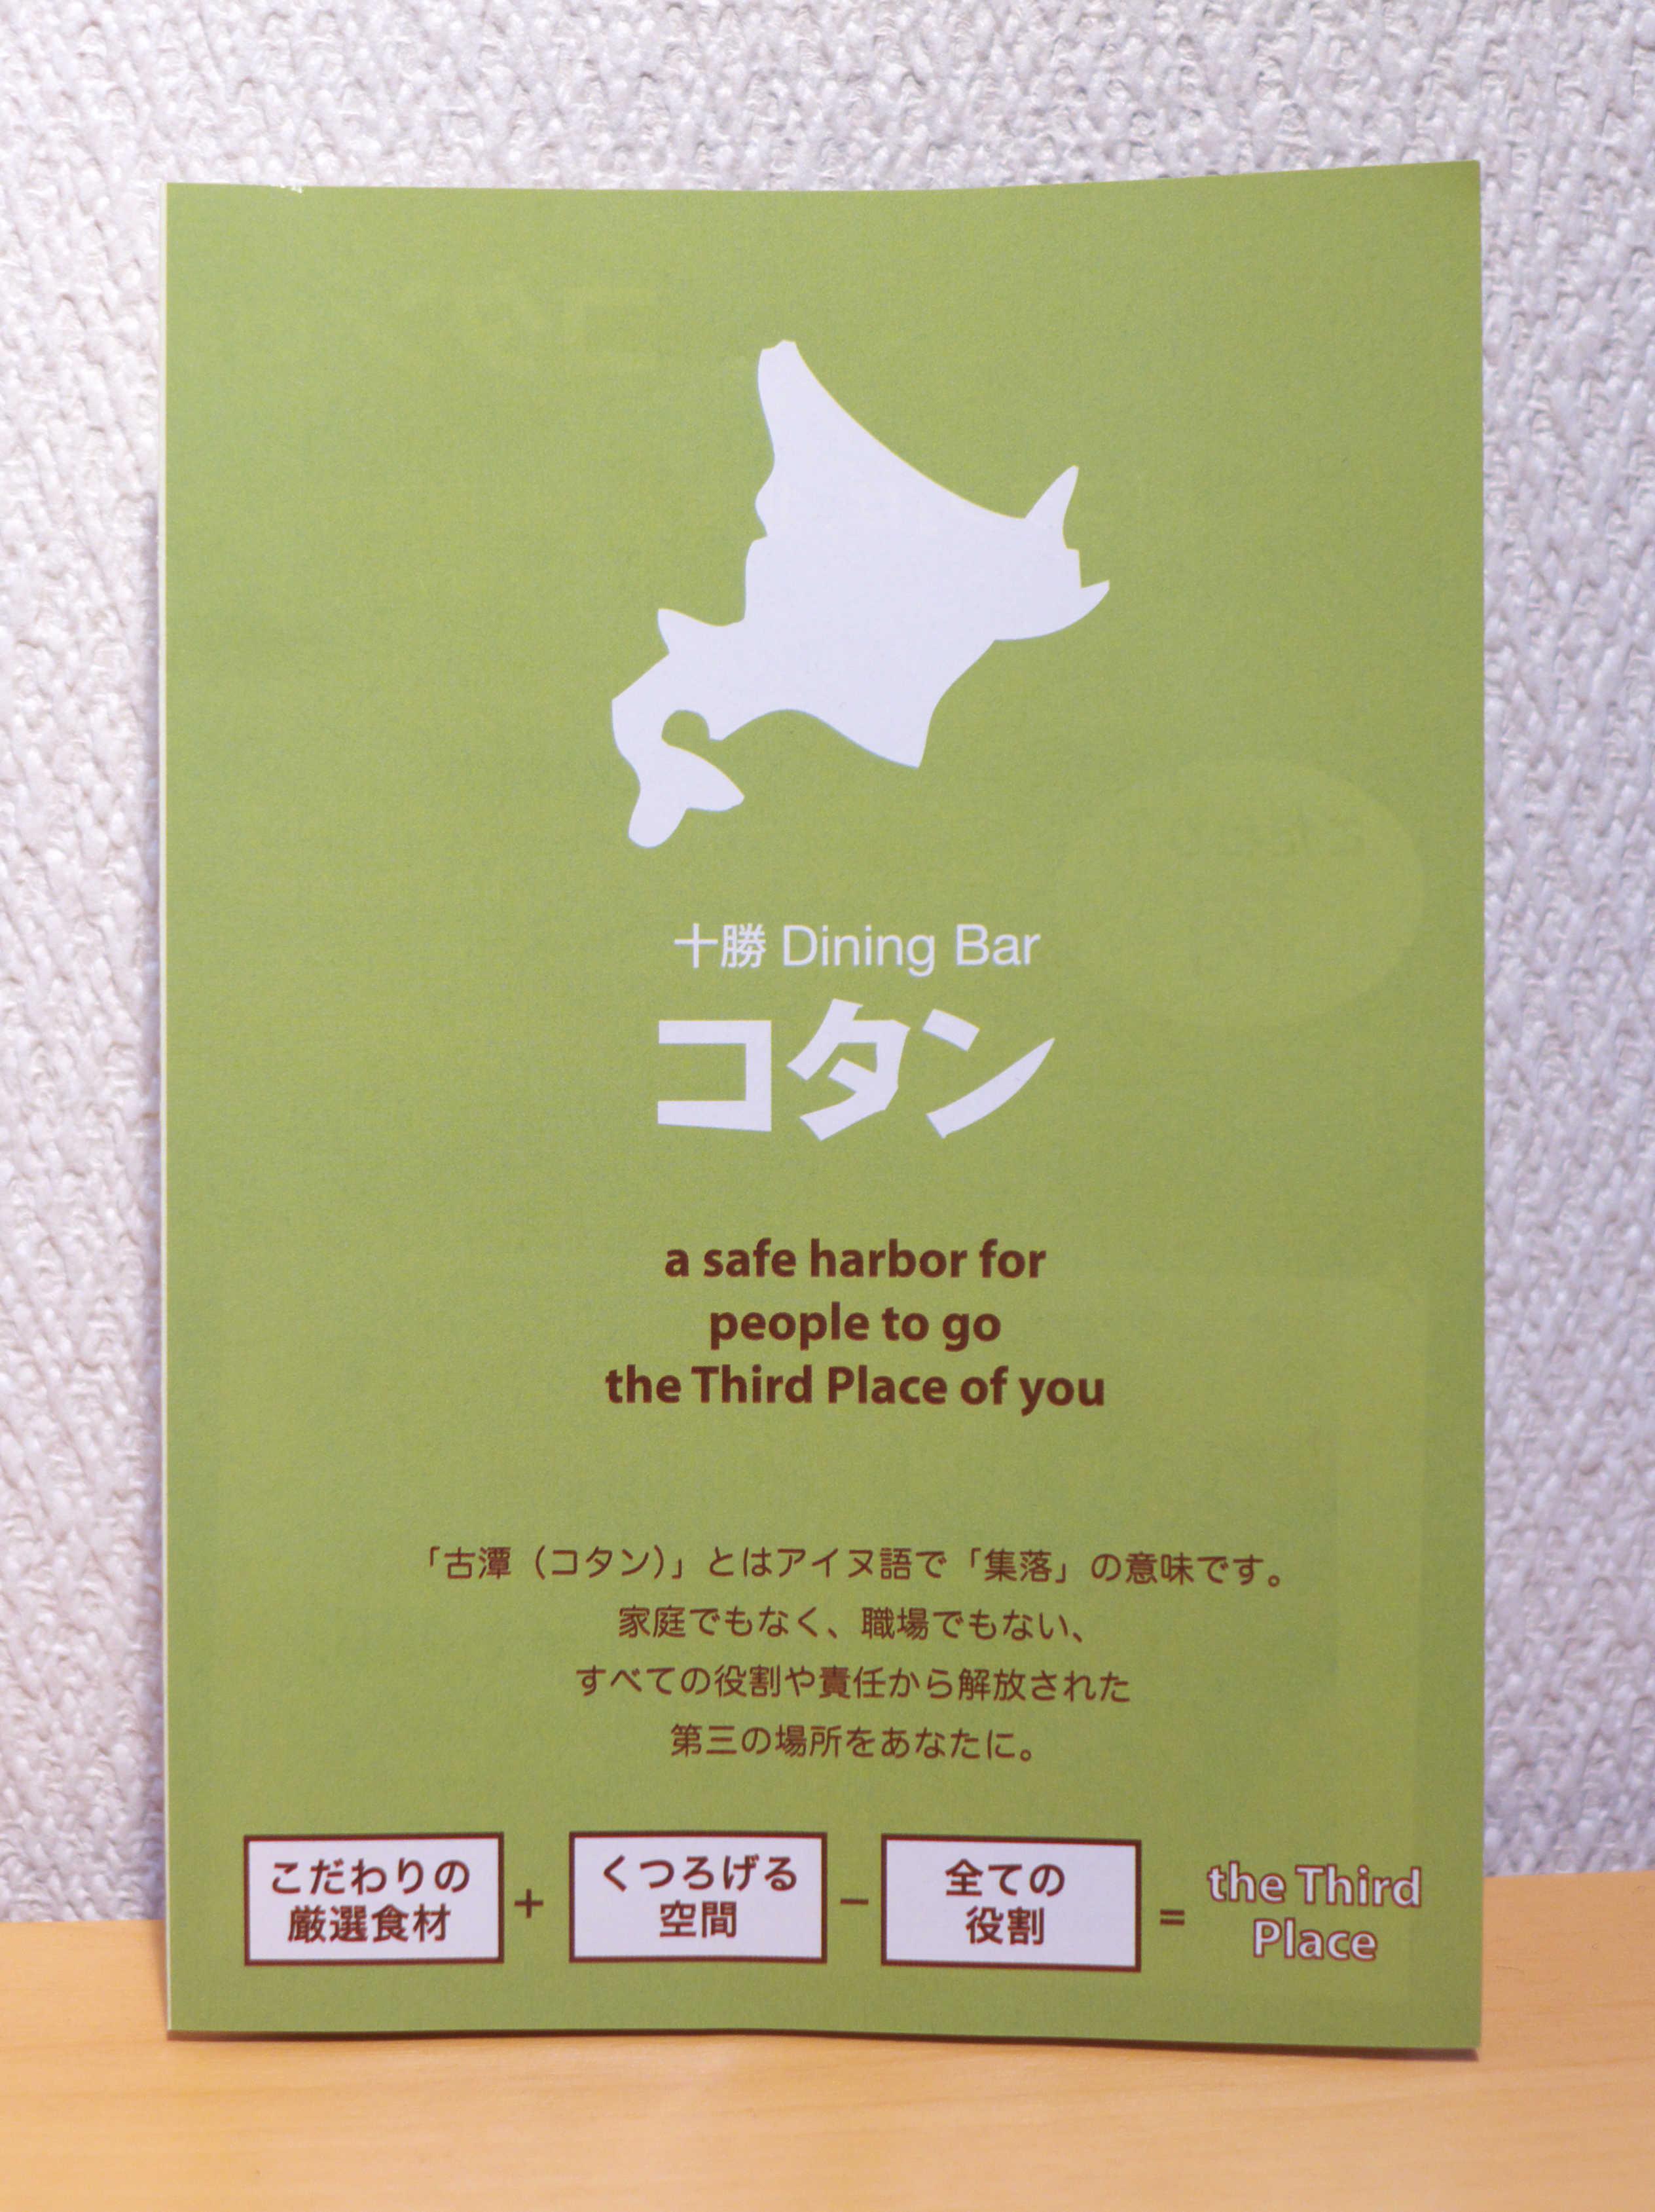 �\�� Dining Bar �R�^��